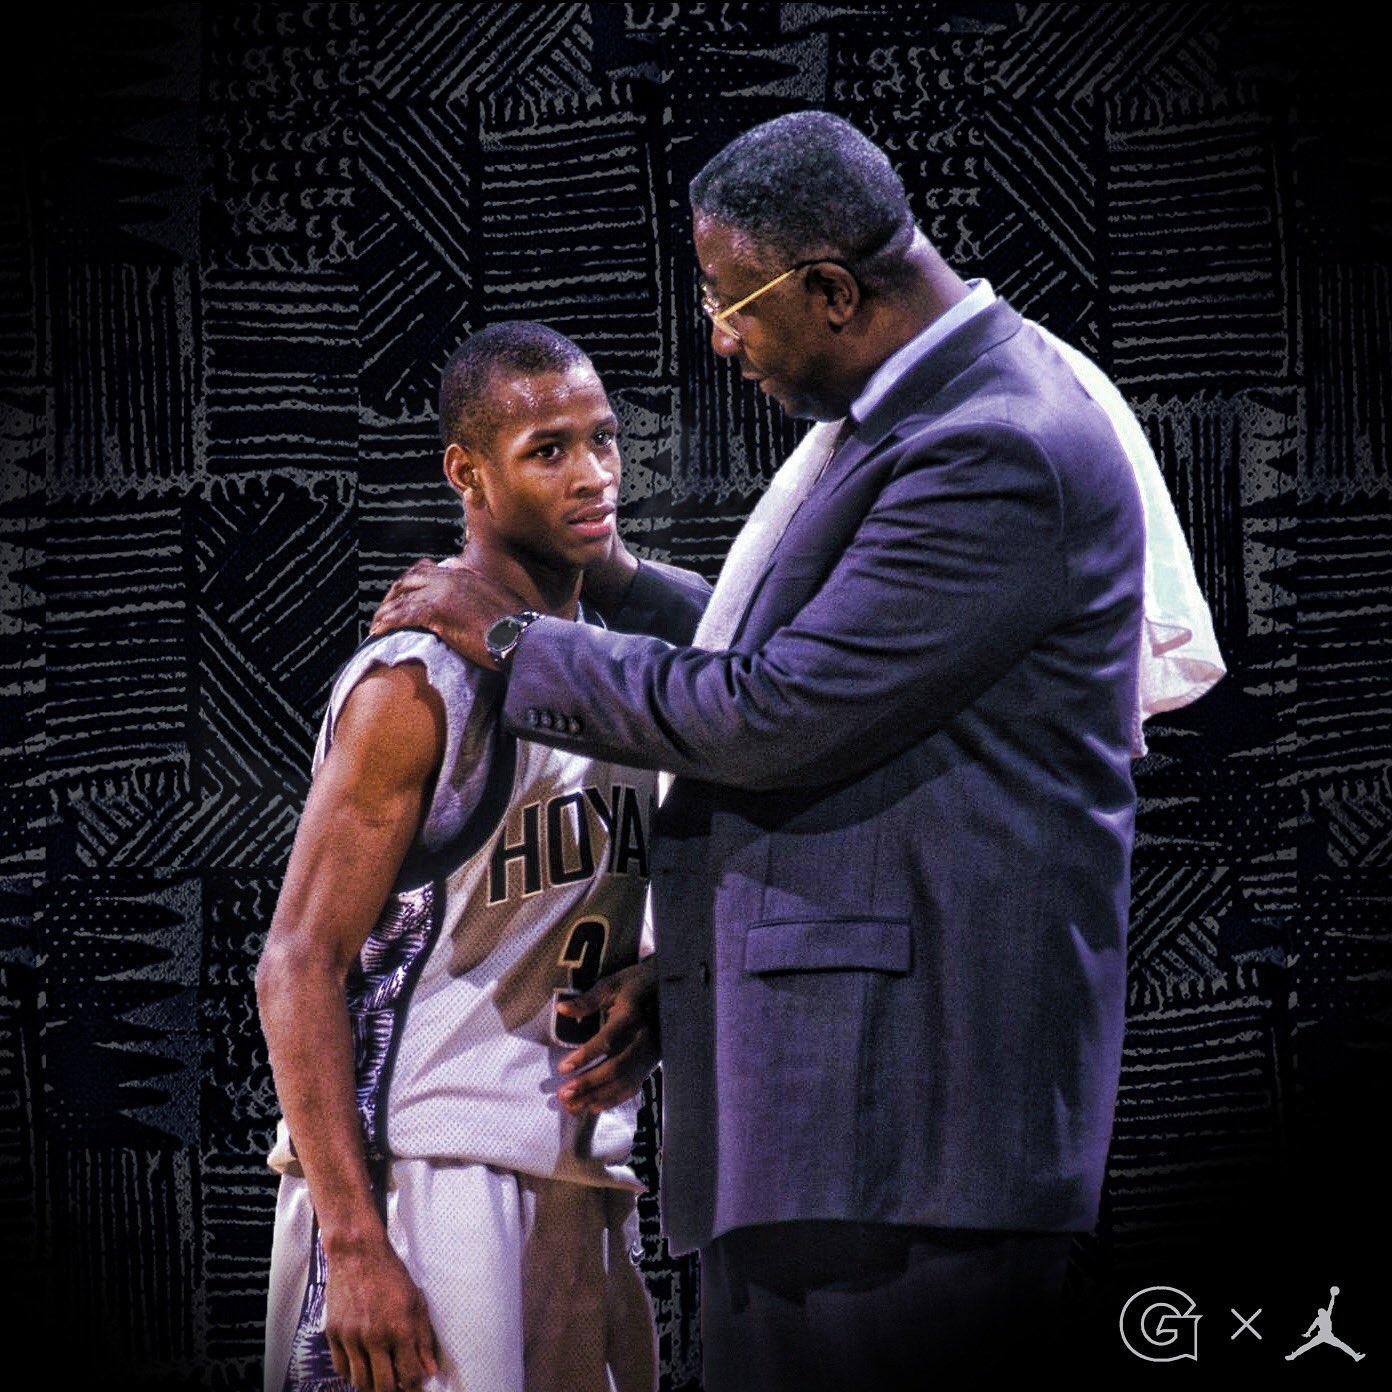 Georgetown Hoyas NCAA Basketball: Happy Birthday, Coach Thompson! 🎉.  Tweet by @GeorgetownHoops